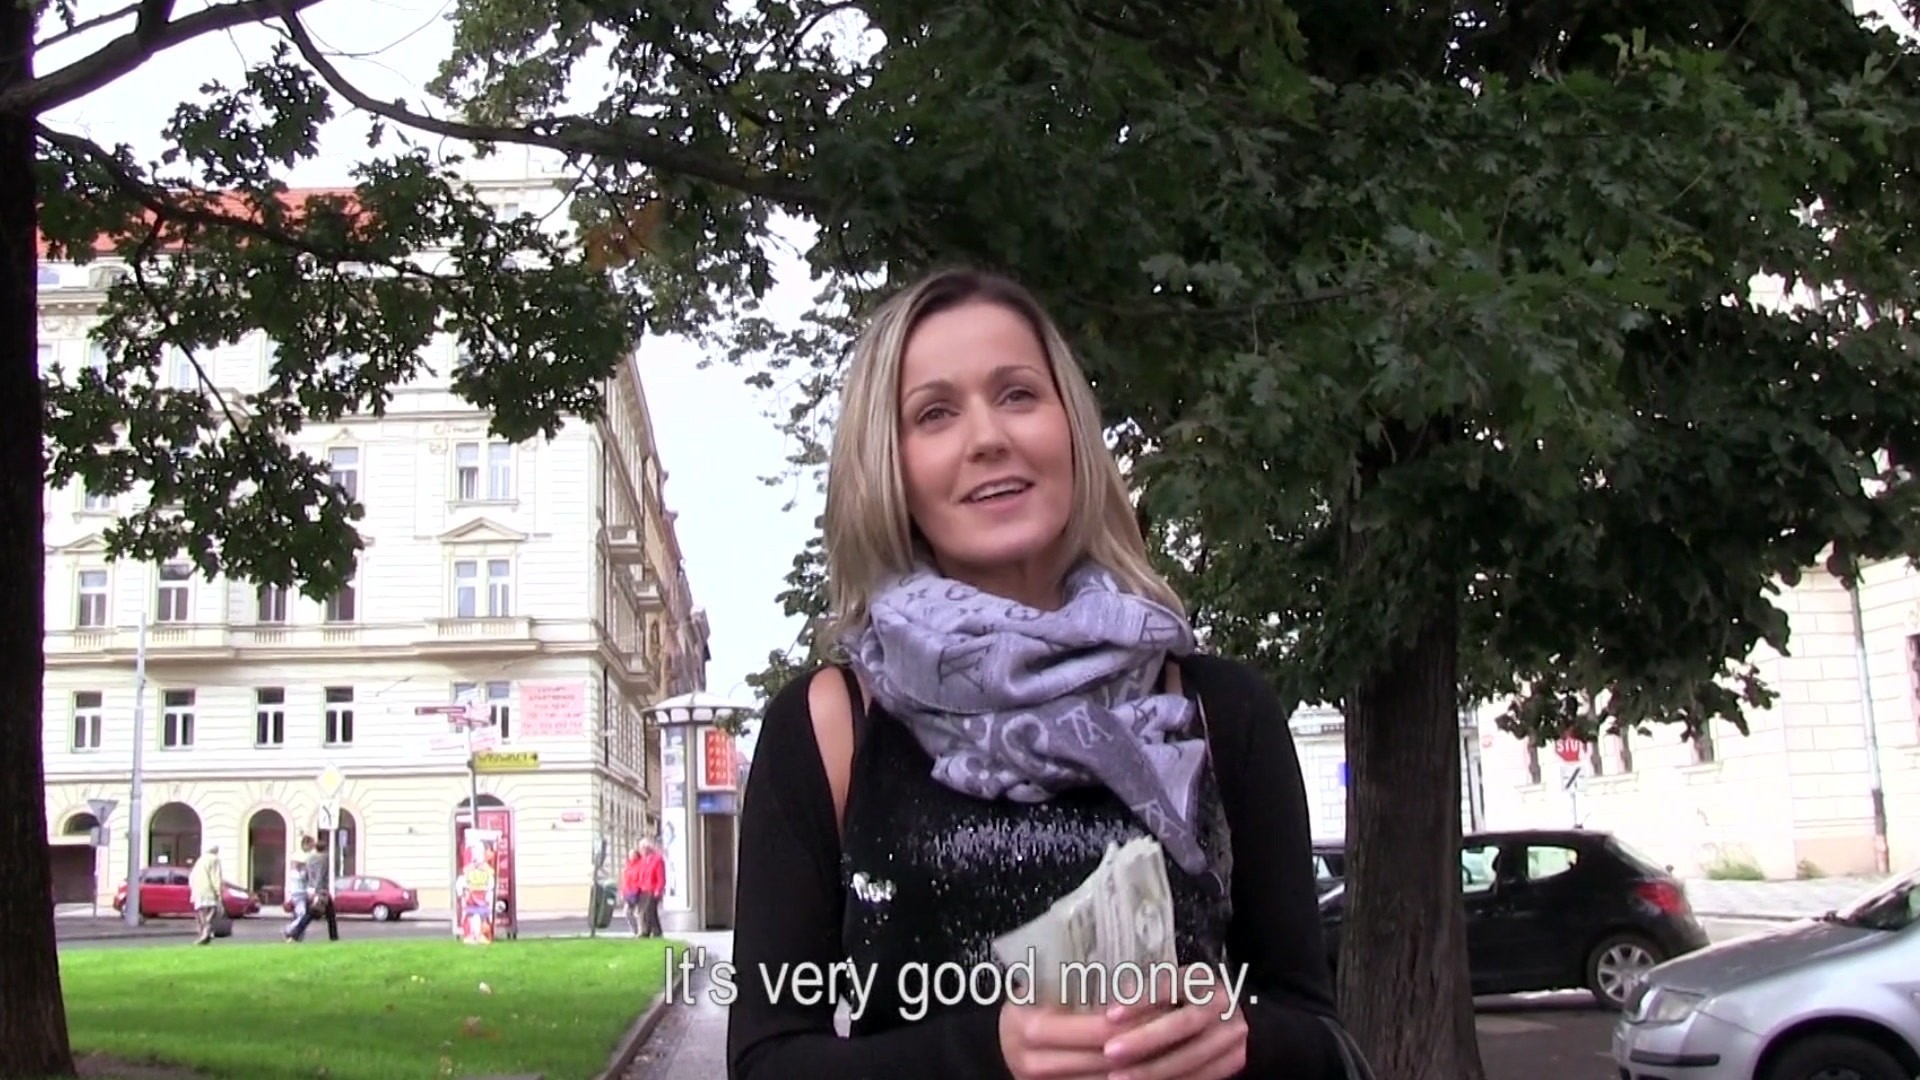 Boning off the beaten path video starring blanka grain 10